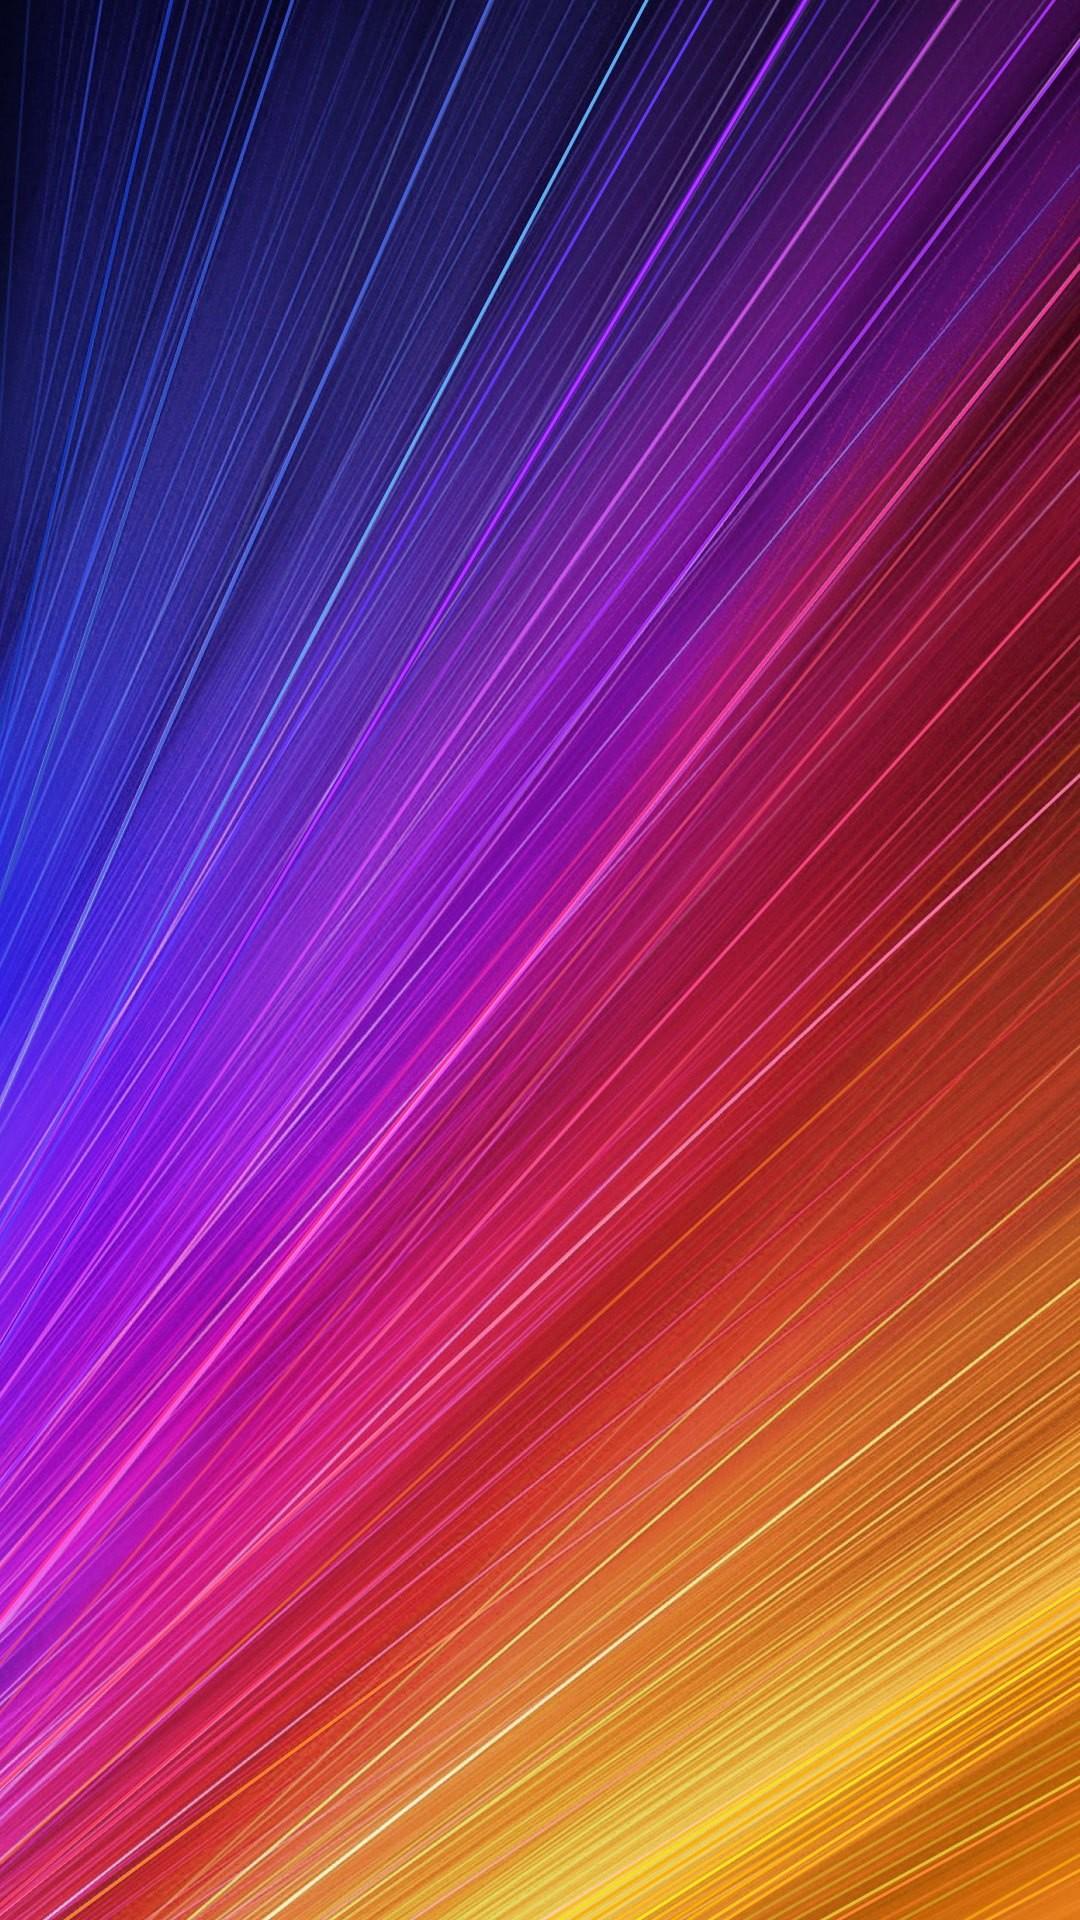 Xiaomi Redmi Note 4 Stock Wallpapers 02 1080 X 1920